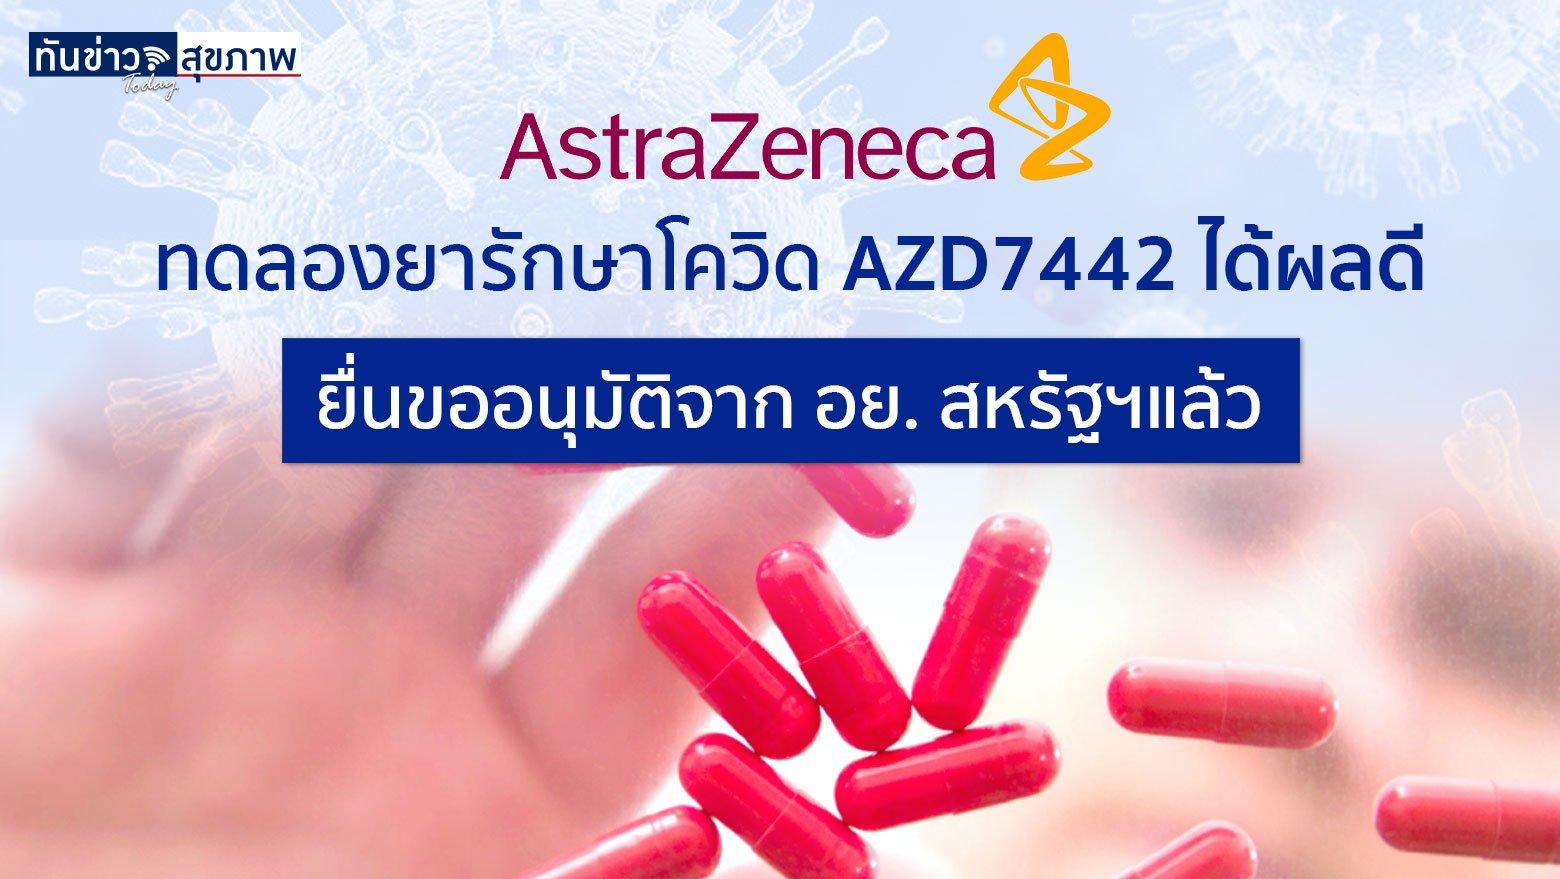 AstraZeneca เผยการทดลองยารักษาโควิด AZD7442 ขั้นสุดท้ายได้ผลน่าพอใจ ลดอาการป่วยขั้นรุนแรงได้ 50% และได้ยื่นขออนุมัติการใช้งานกับ FDA สหรัฐแล้ว